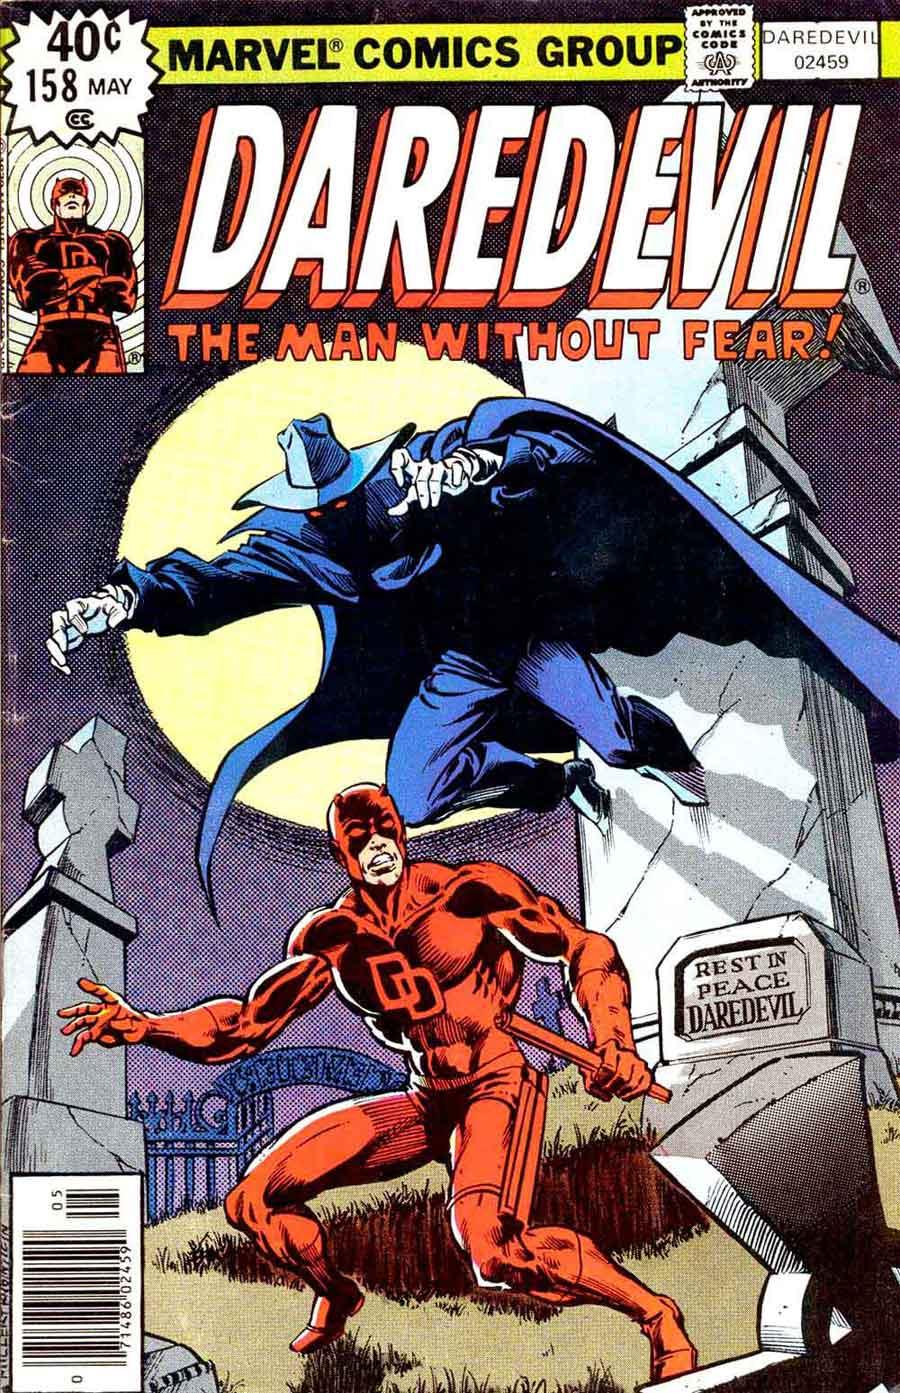 Comic Book Cover Art : Daredevil frank miller art cover pencil ink